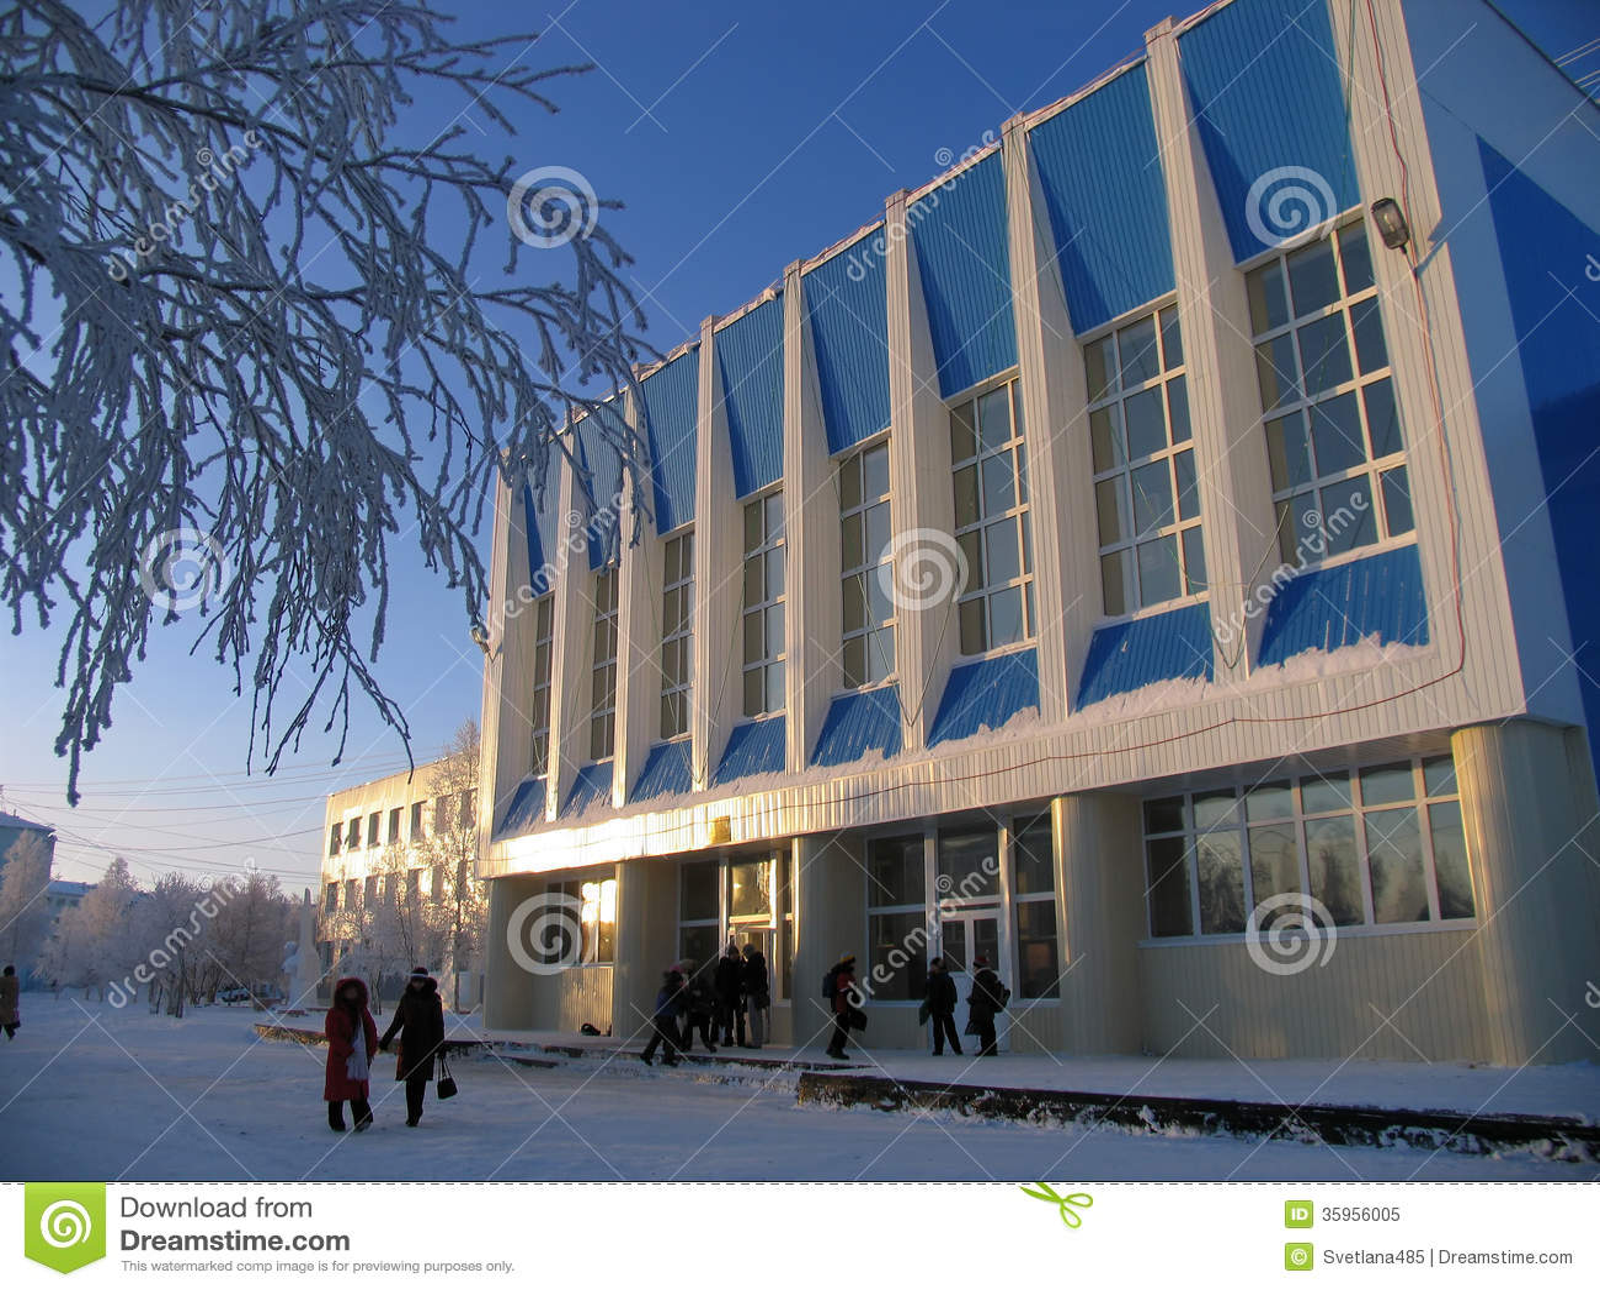 Estructura arquitectónica - escuela.